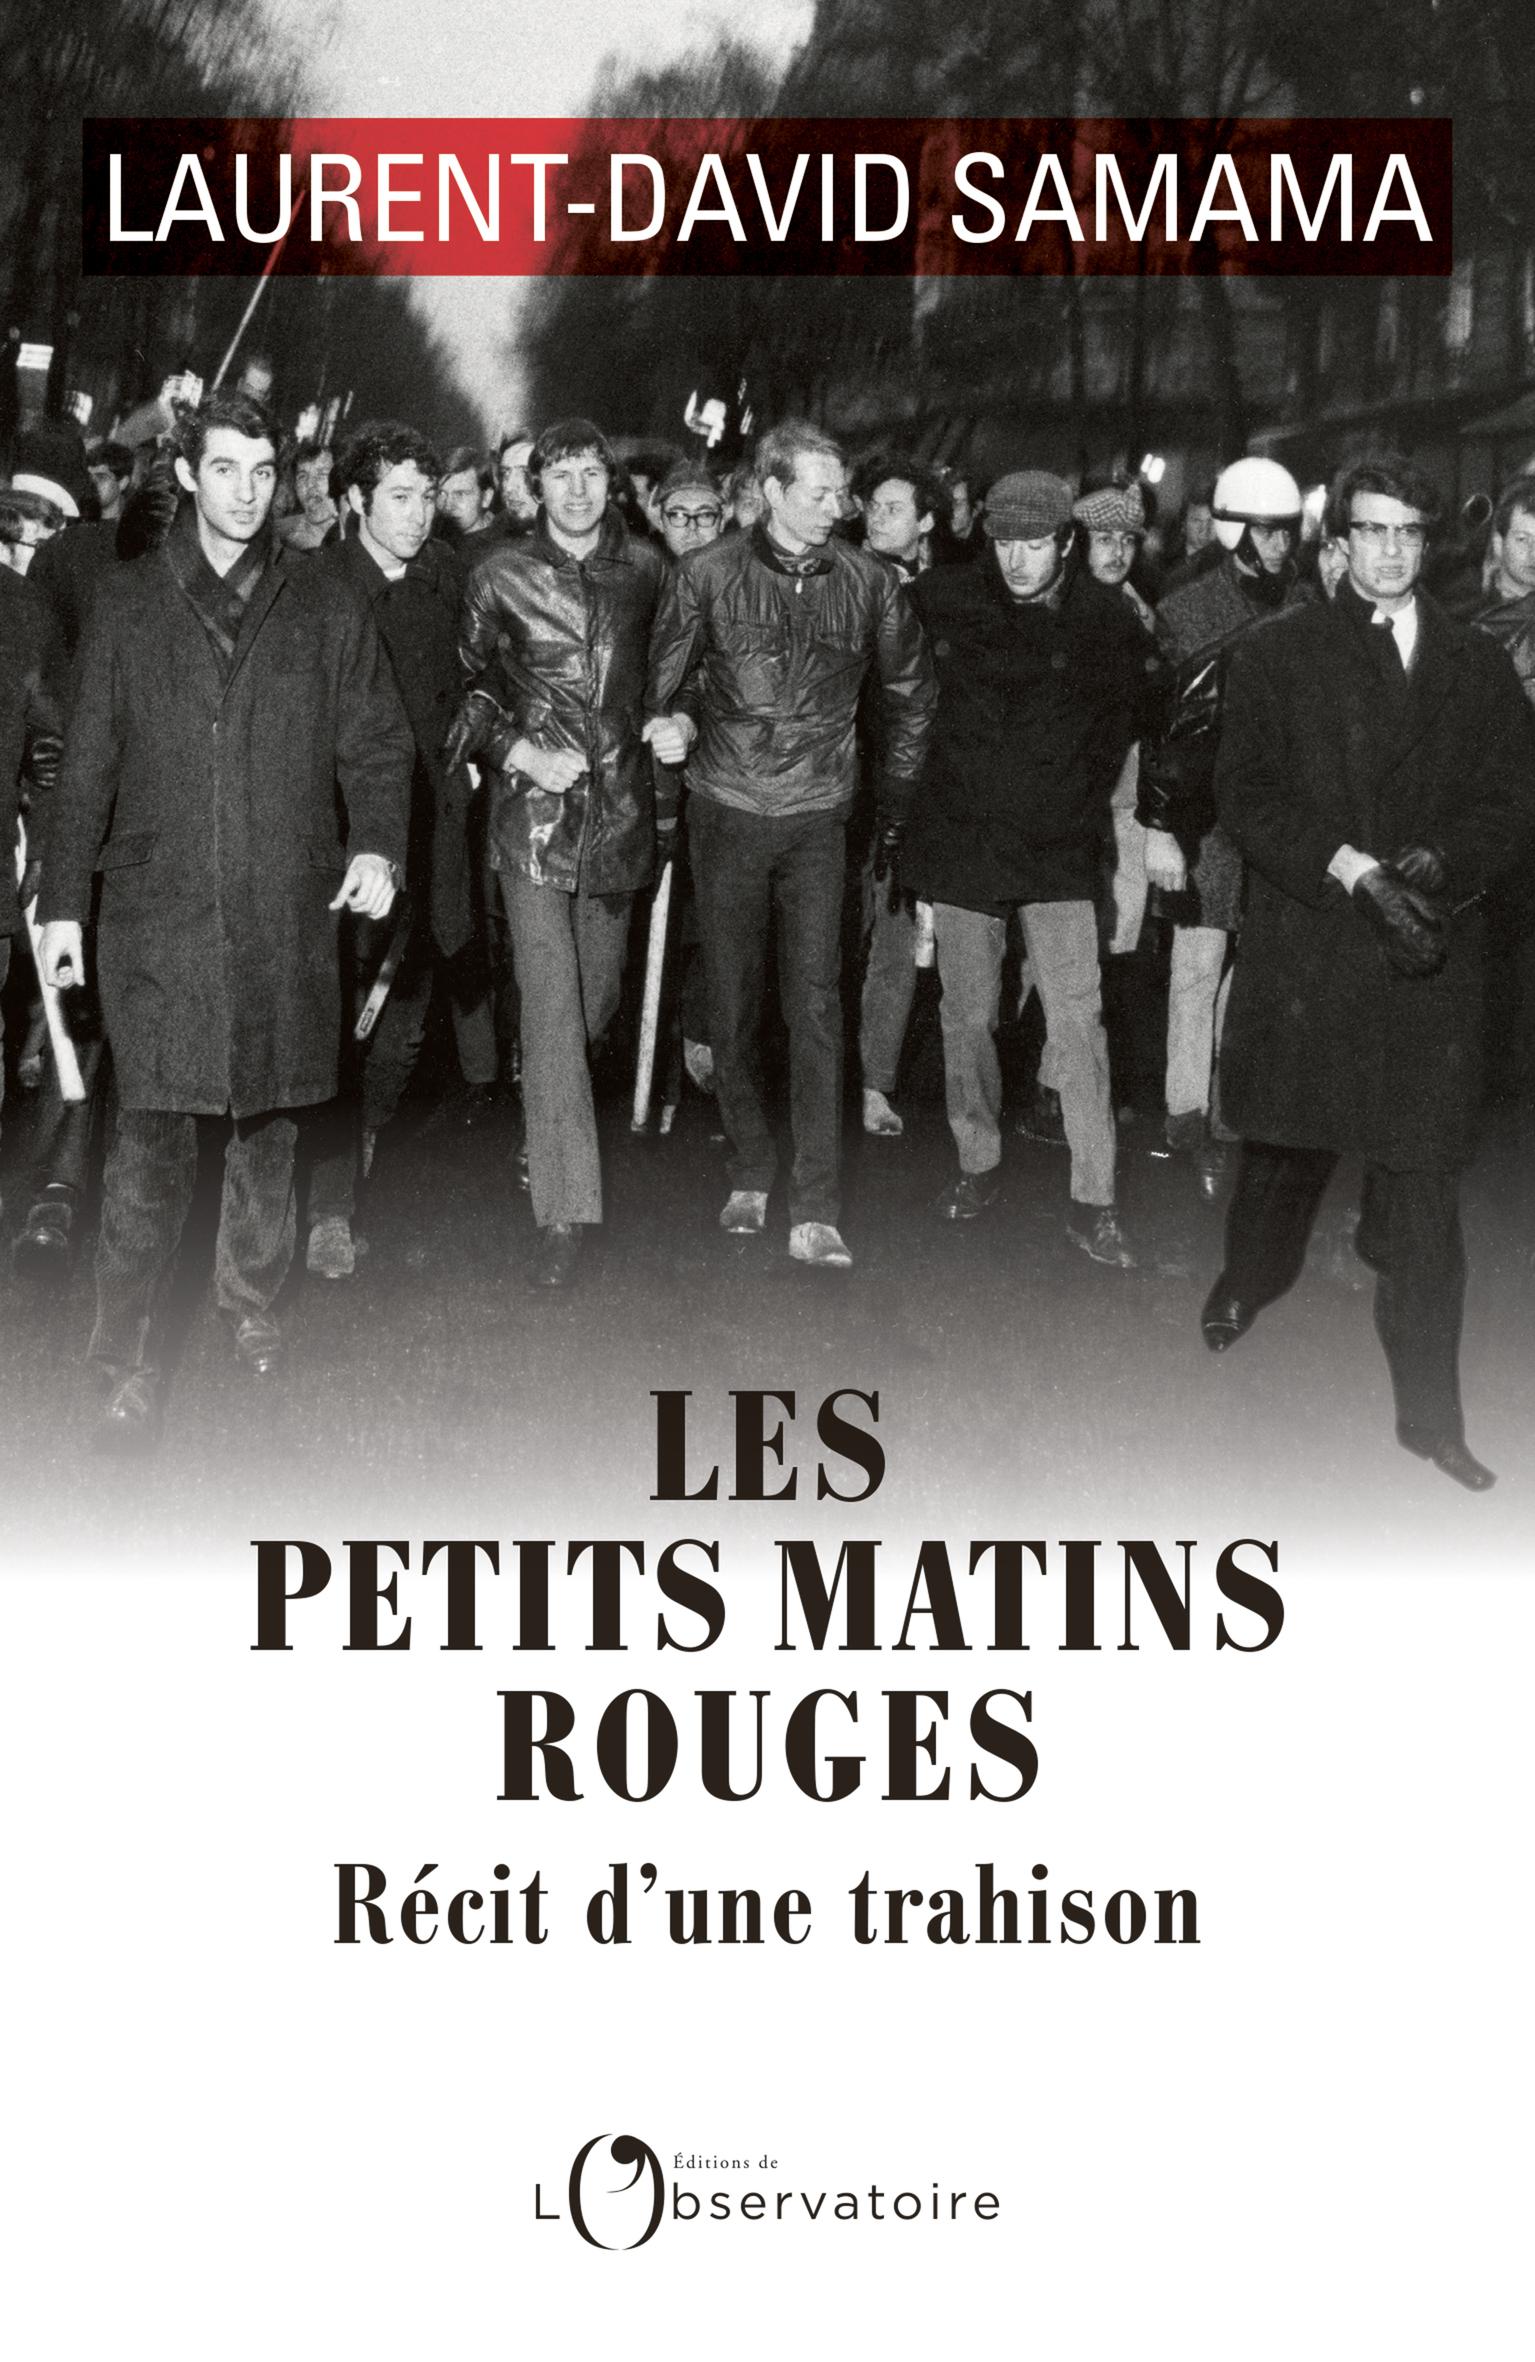 LES PETITS MATINS ROUGES